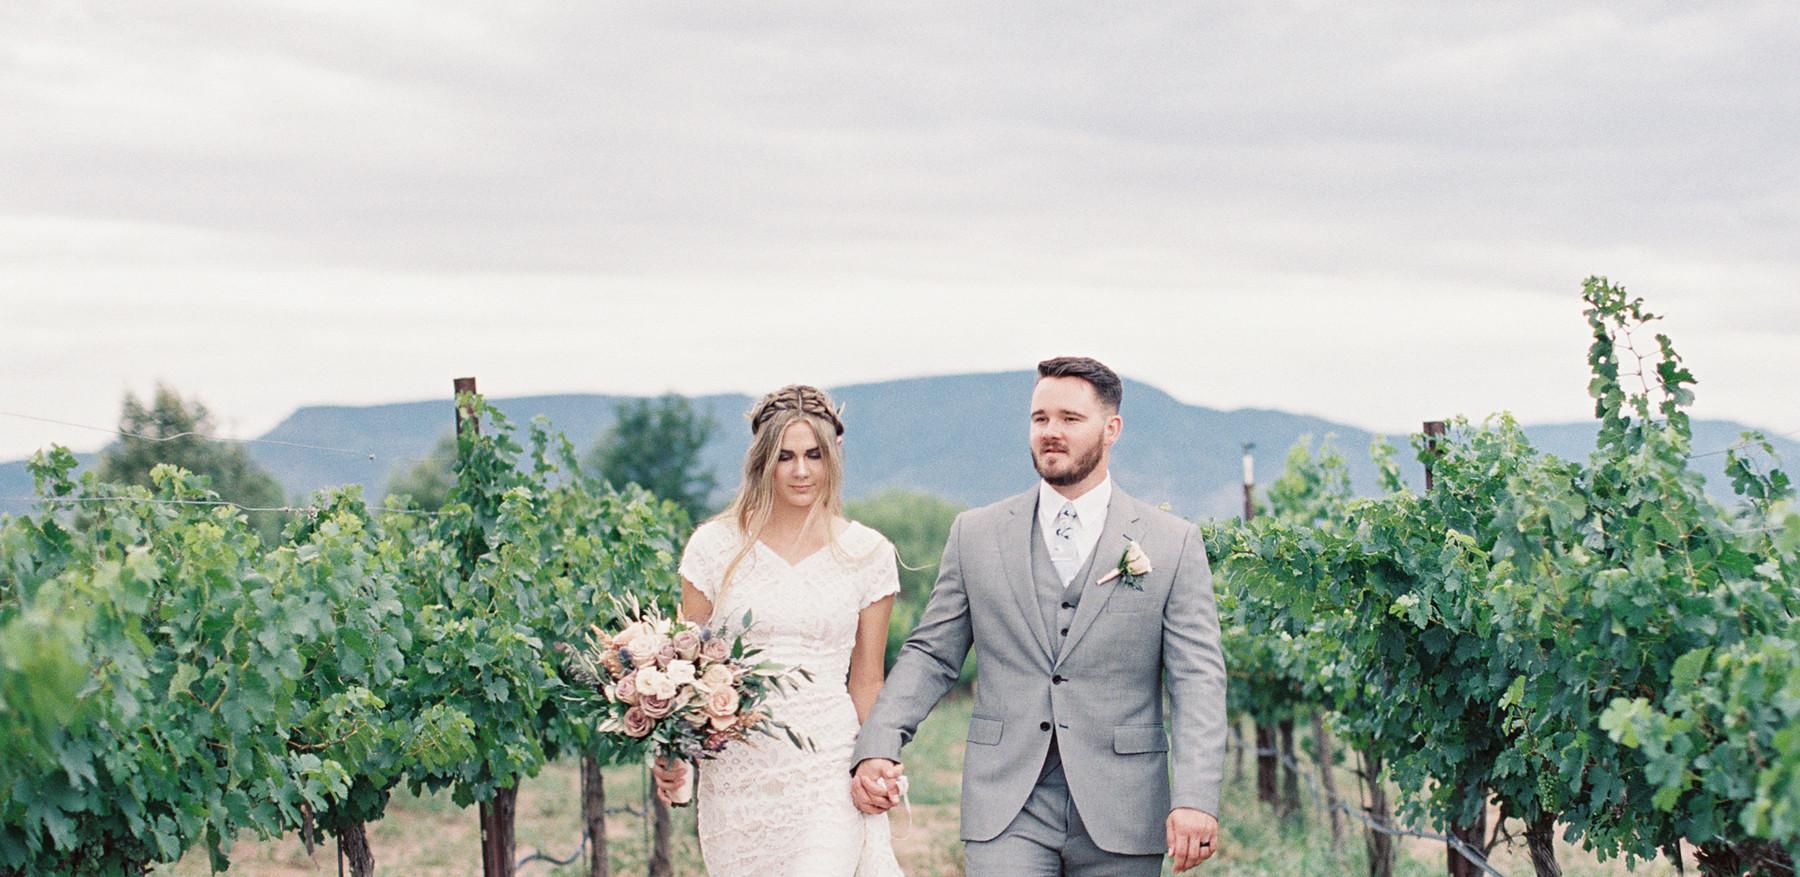 Alcantara vineyards, Cottonwood AZ